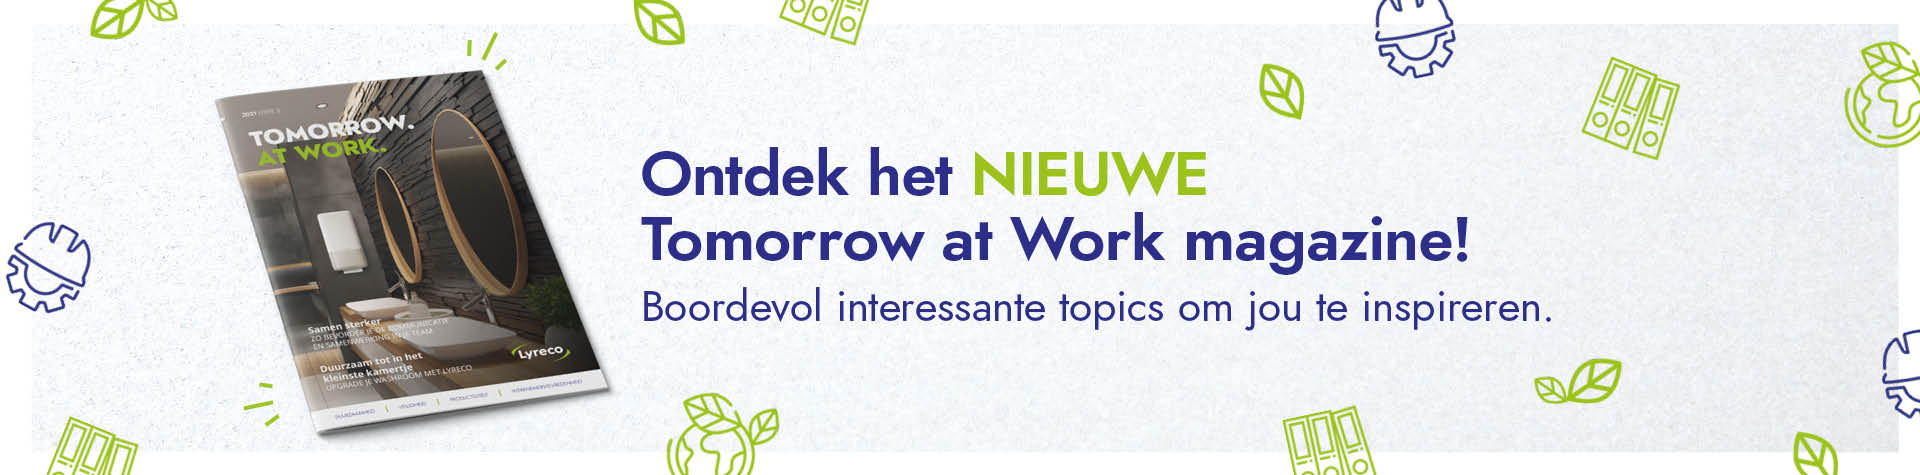 tomorrow at work magazine